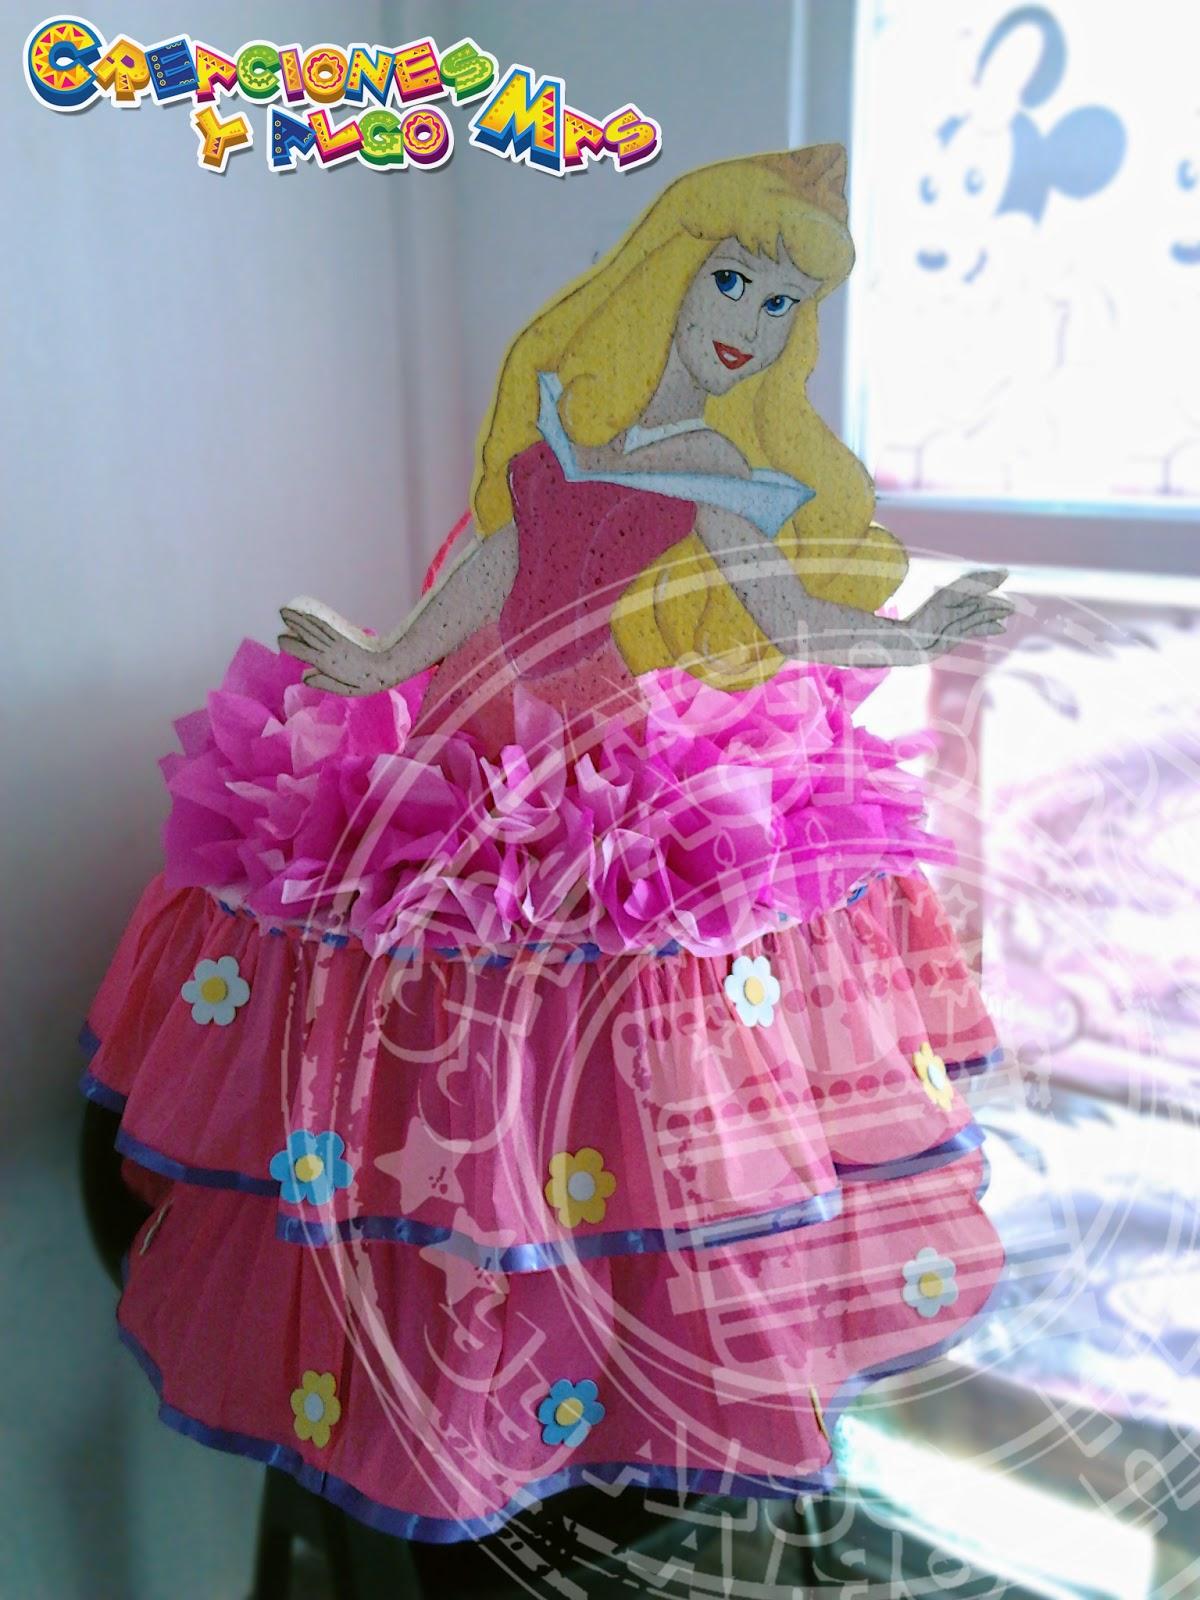 Fiesta motivo princesas disney disney princess party - Regalos para pinatas ...